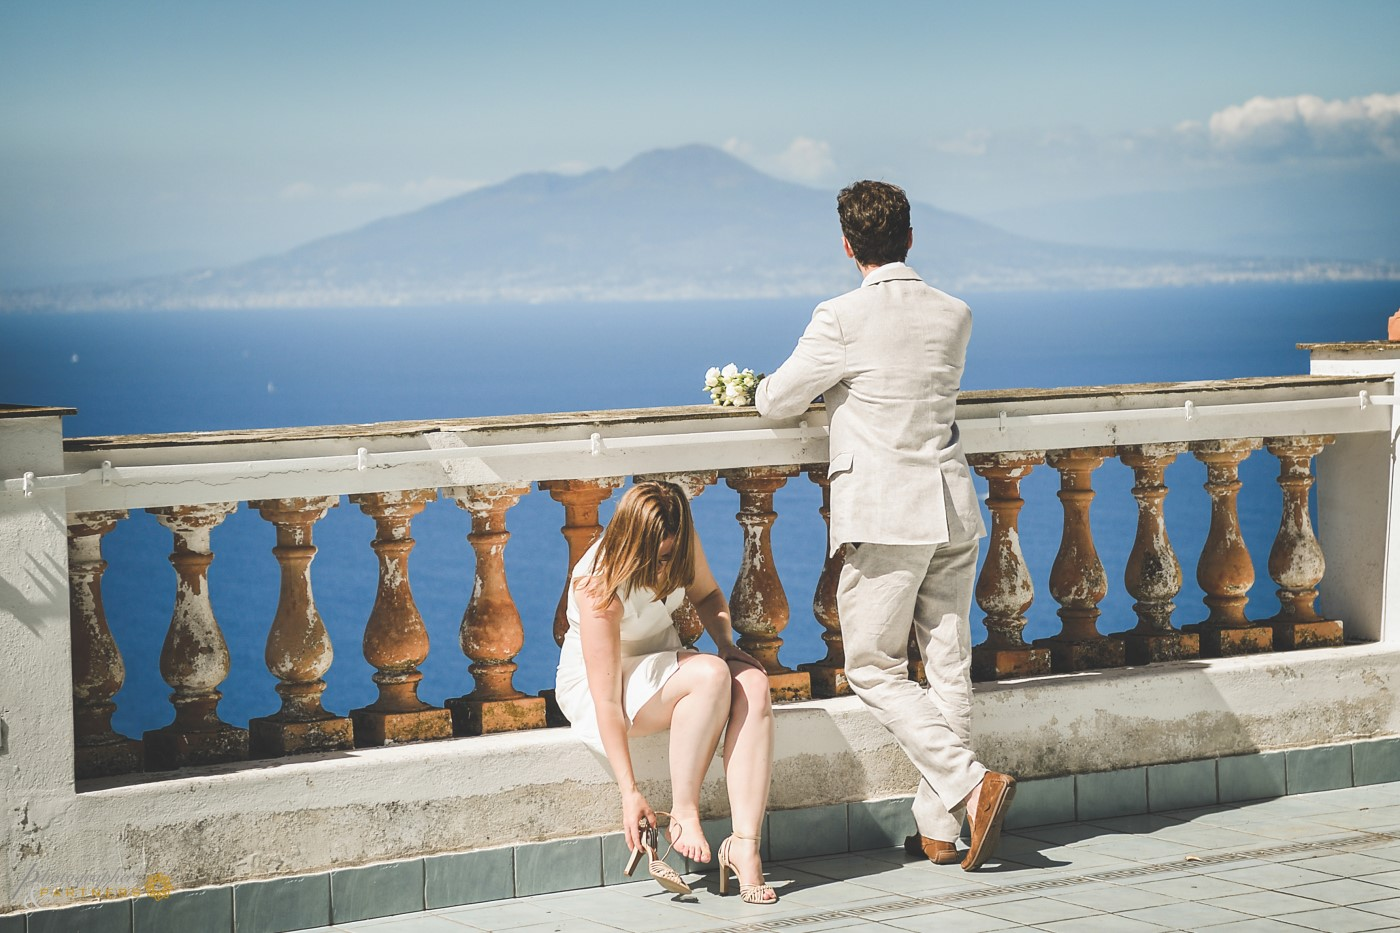 A look at the Vesuvio volcano and the Sorrento peninsula.